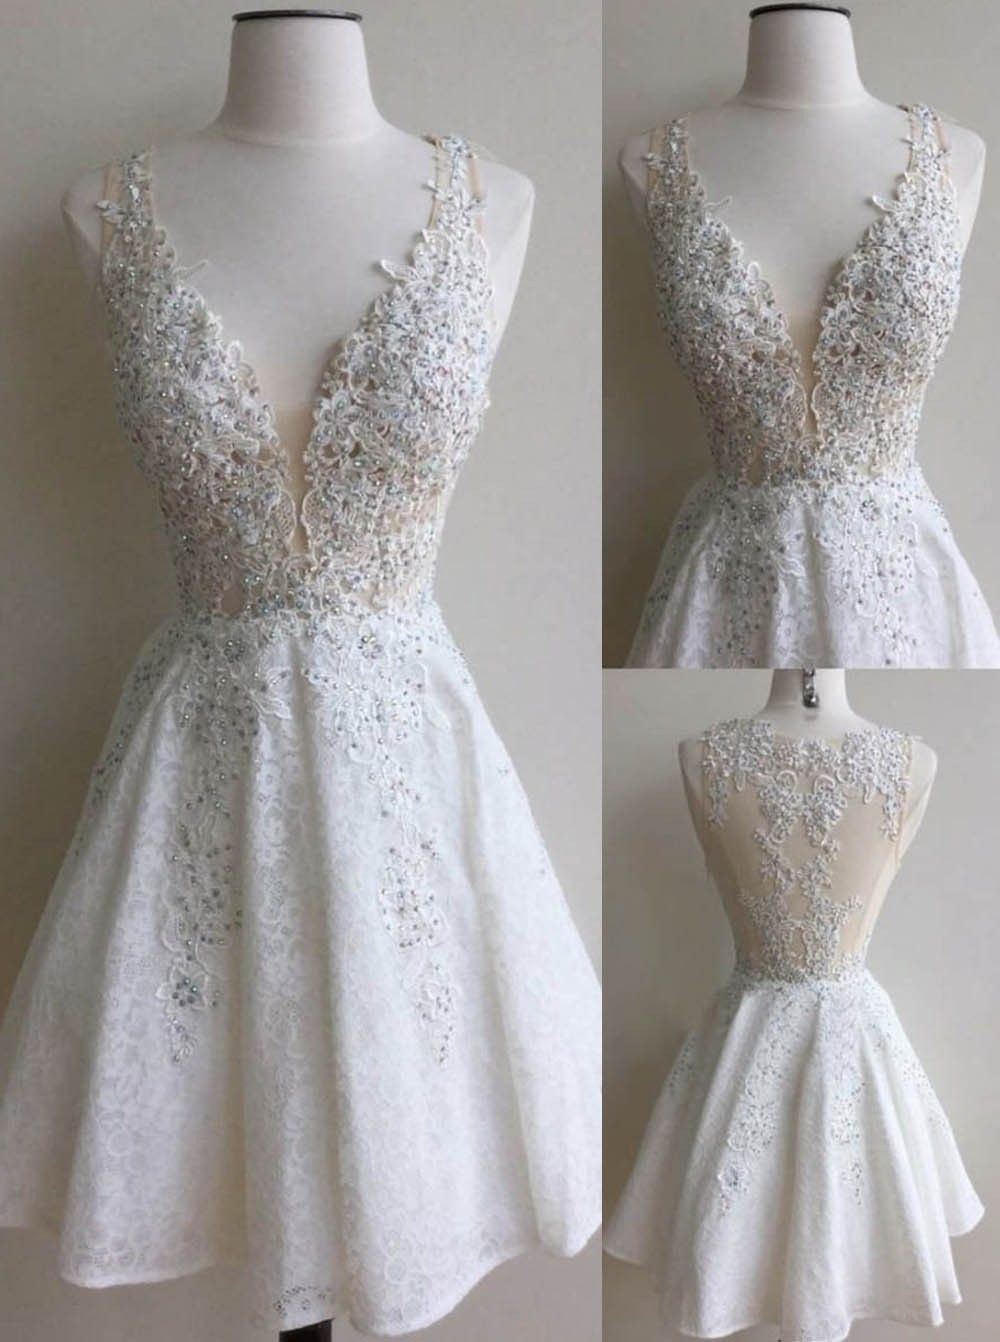 ab4da7e9a95 Elegant Deep V-neck Illusion Back Knee-Length Ivory Lace Homecoming Dress  with Appliques Beading. 2017 New arrivals princess lace short ...